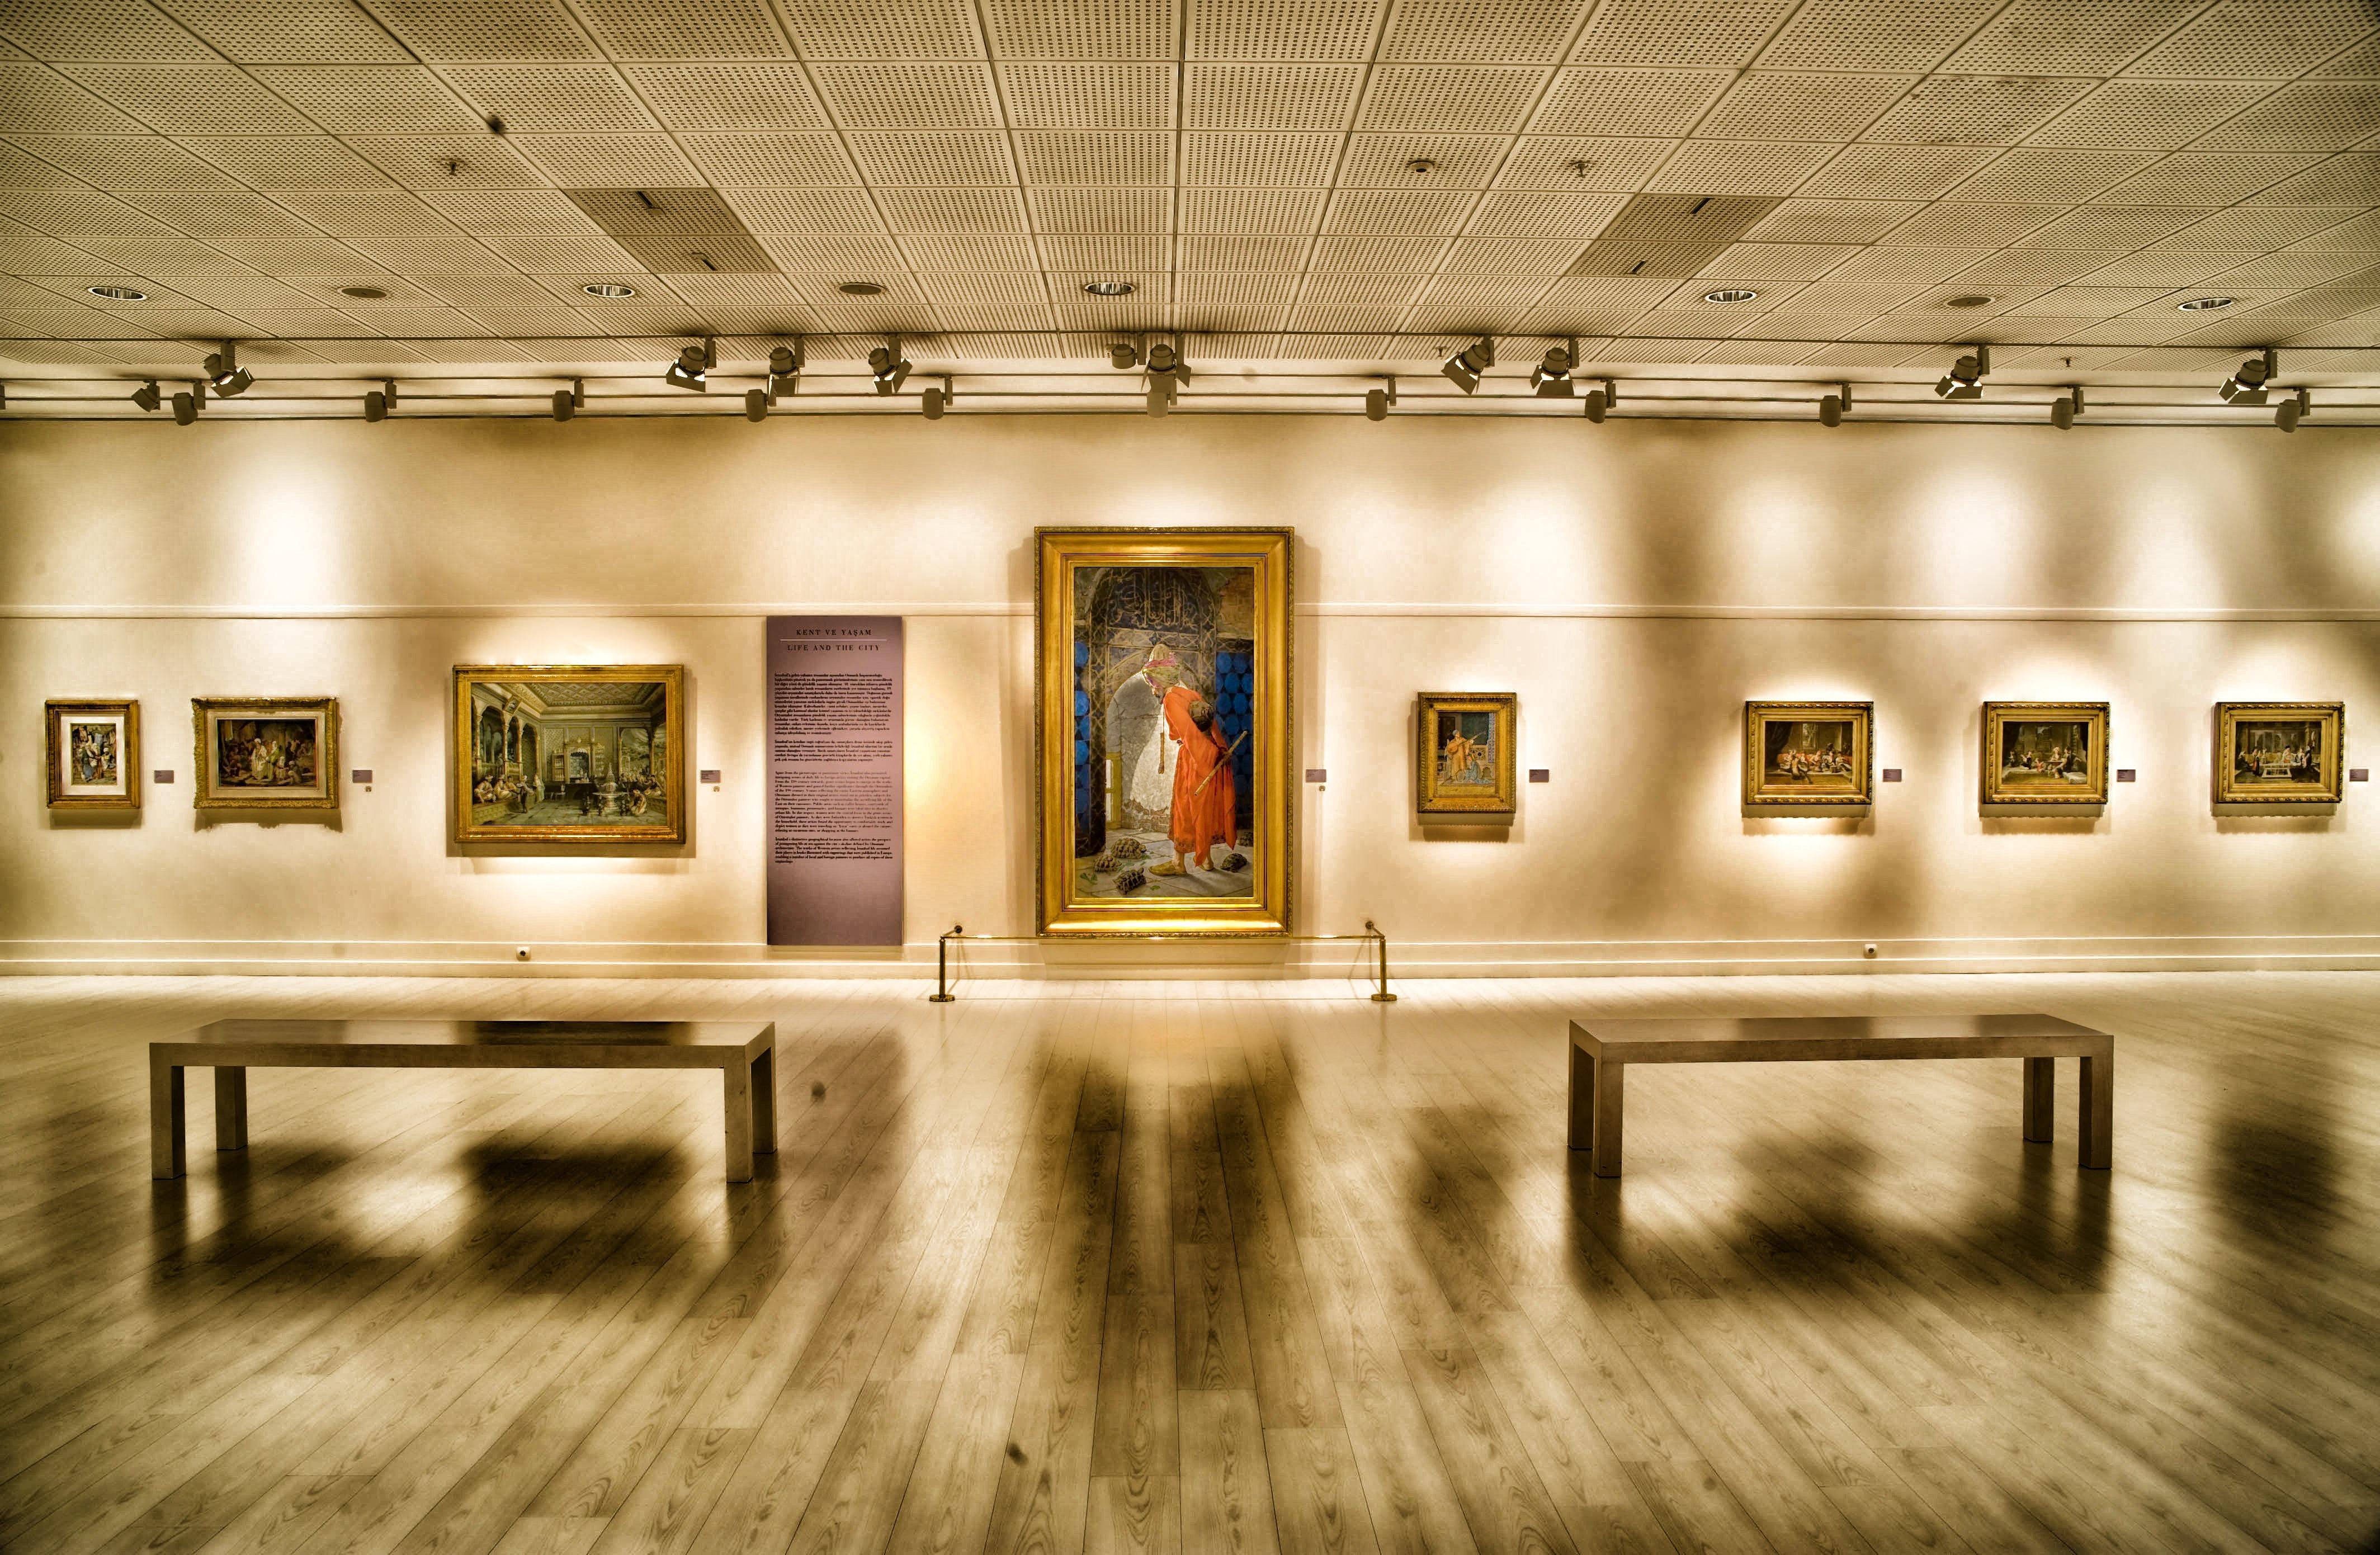 Free Images Architecture Museum Painting Interior